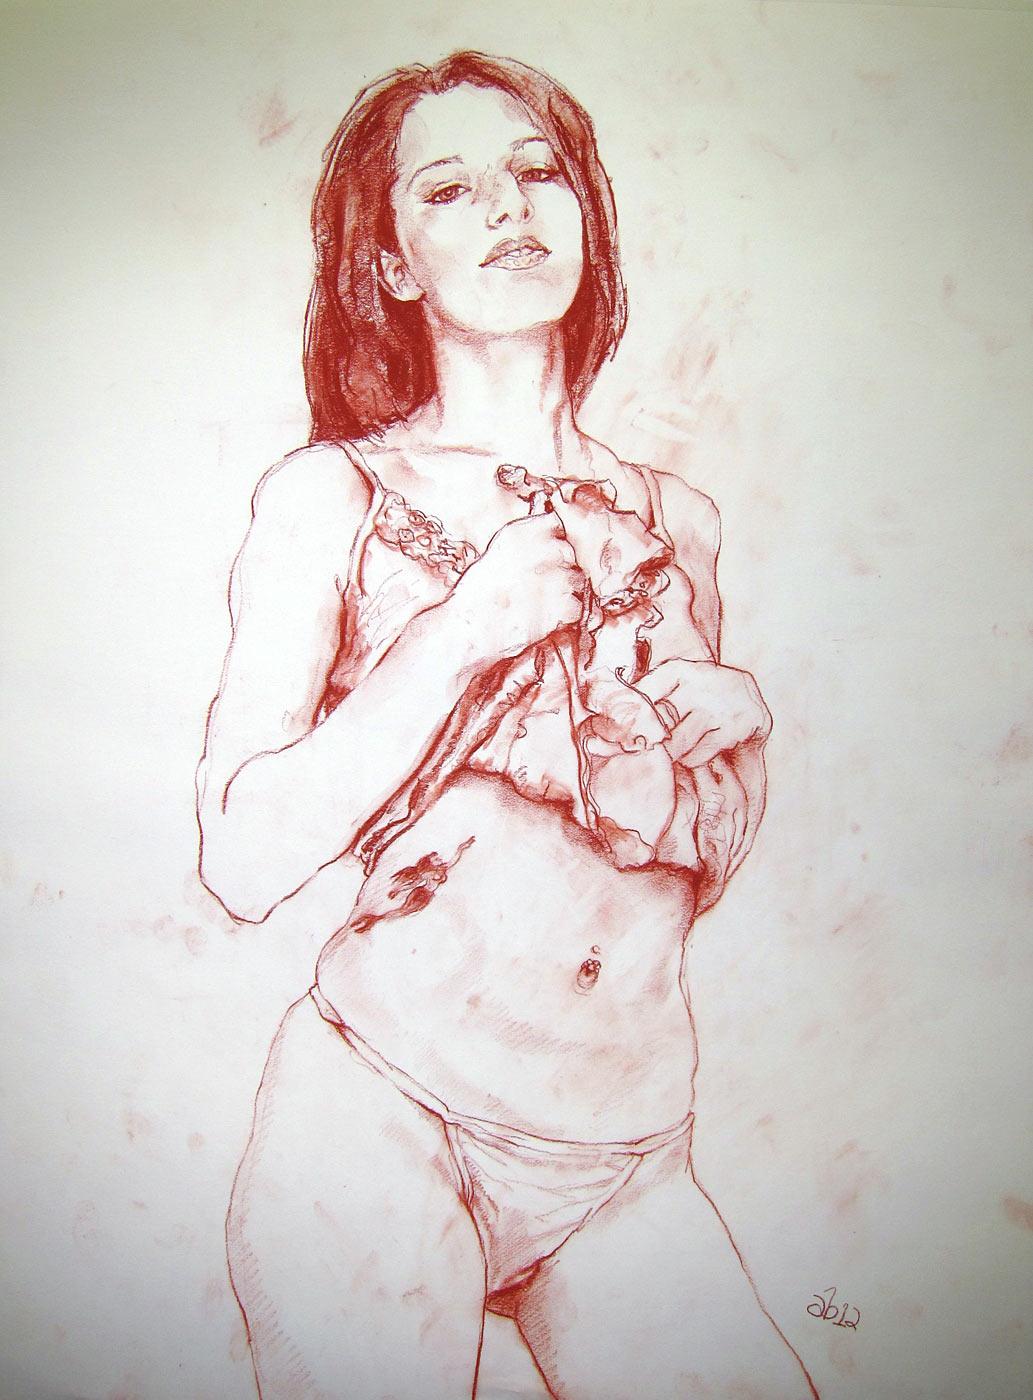 Erotic draw fucked pic